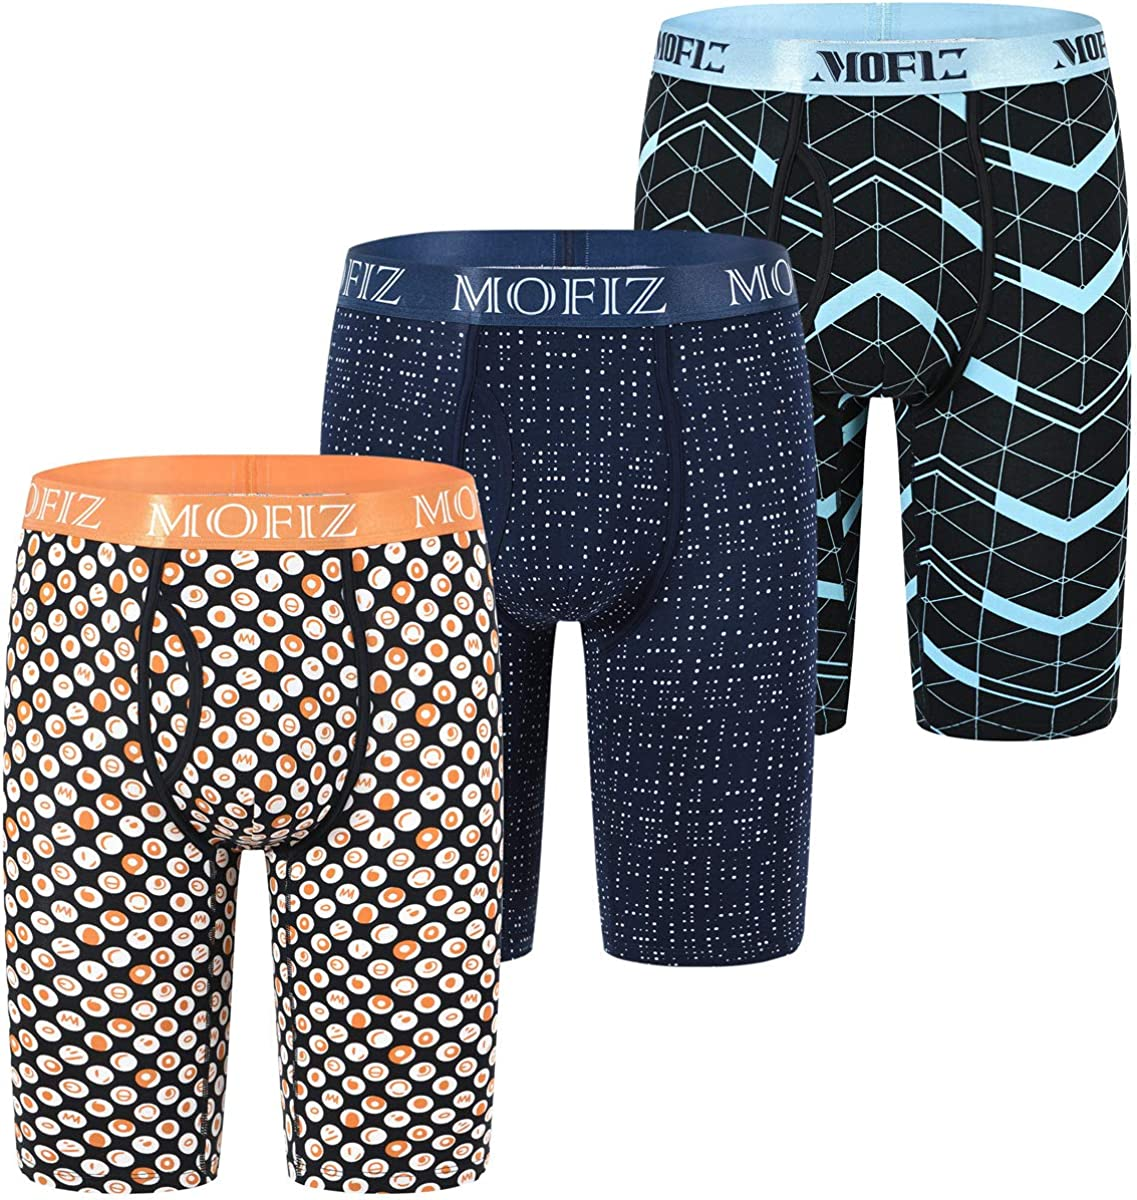 JINSHI Men's Underwear Extra Long Leg Boxer Briefs Inseam 8